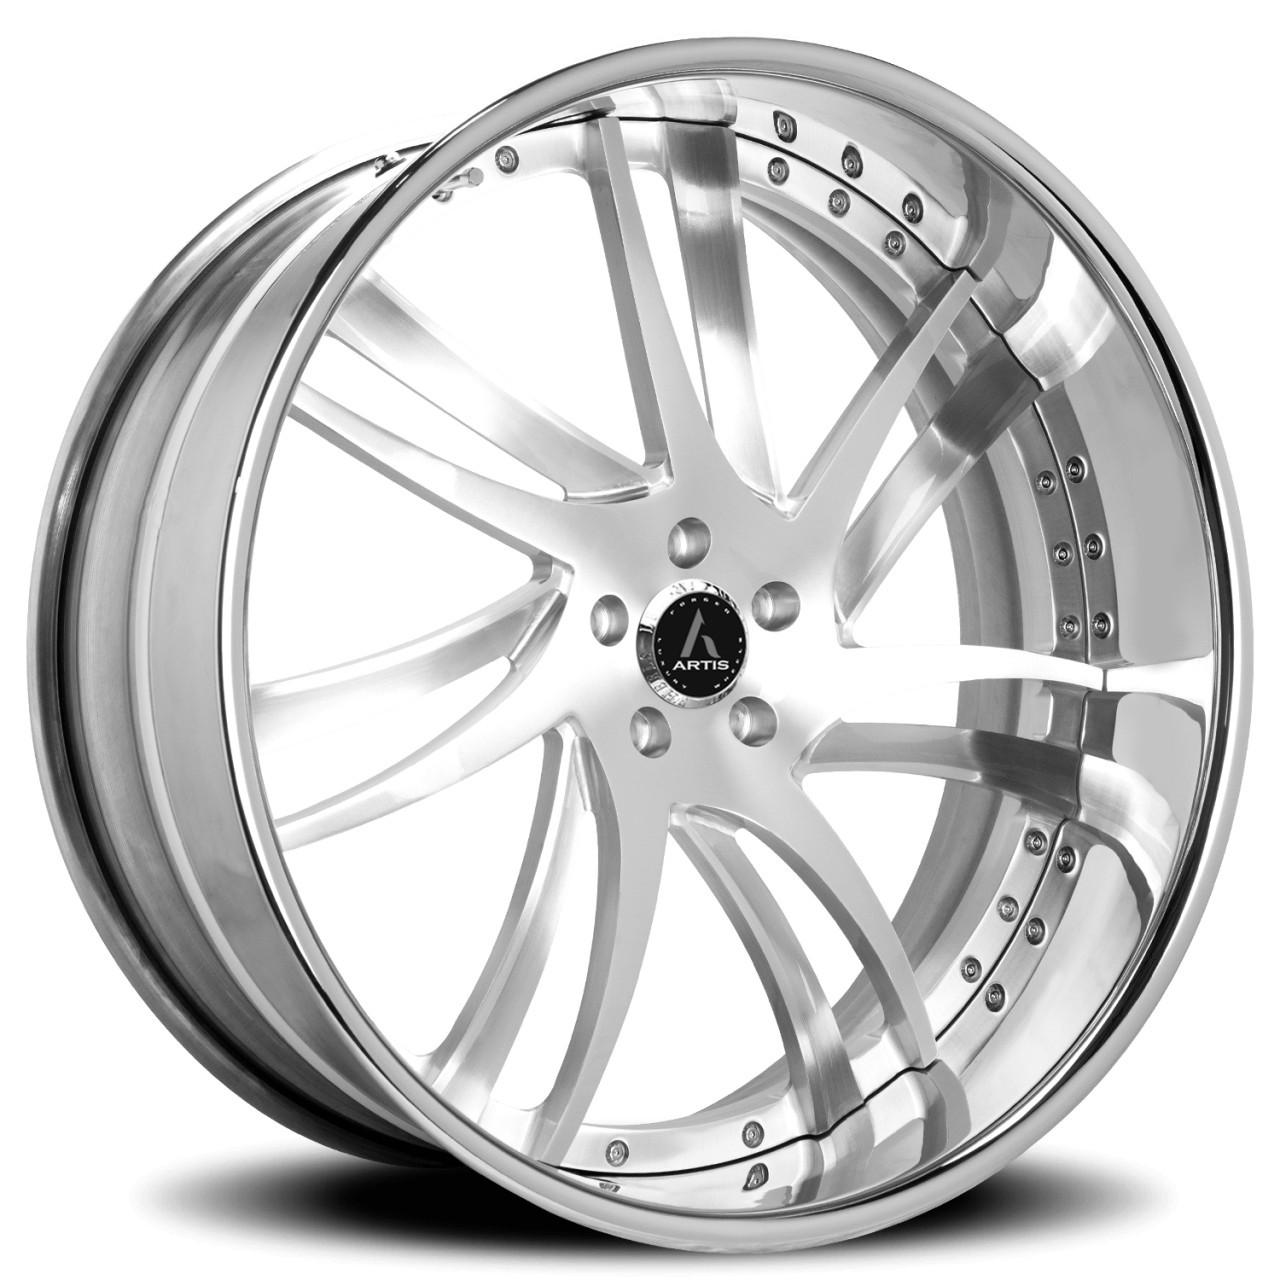 Artis Profile forged wheels